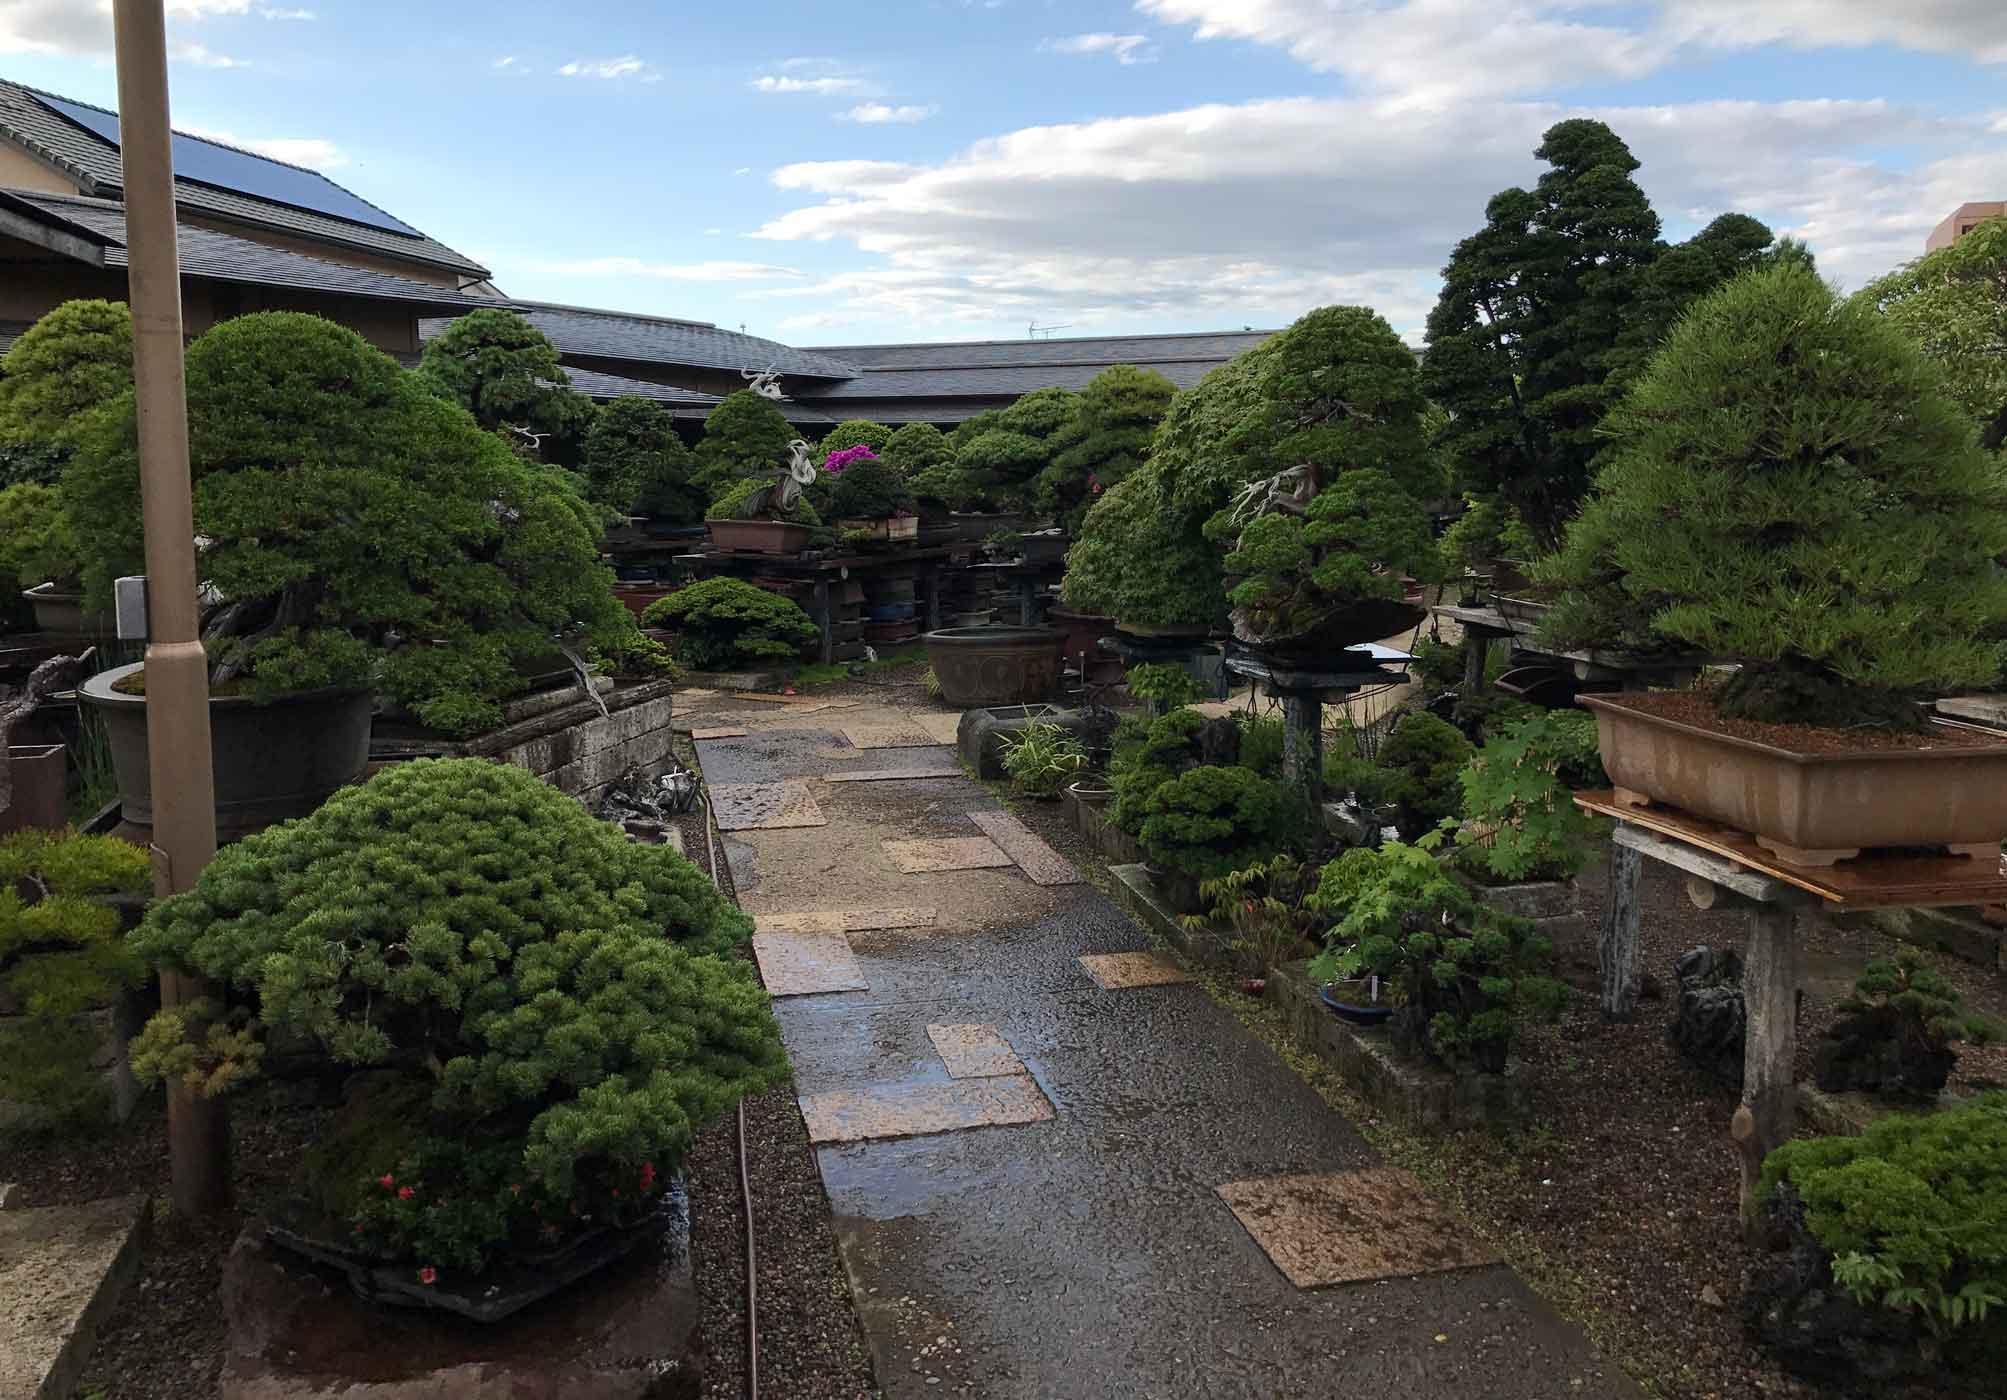 Mansei-en bonsai nursery at Omiya, near Tokyo.